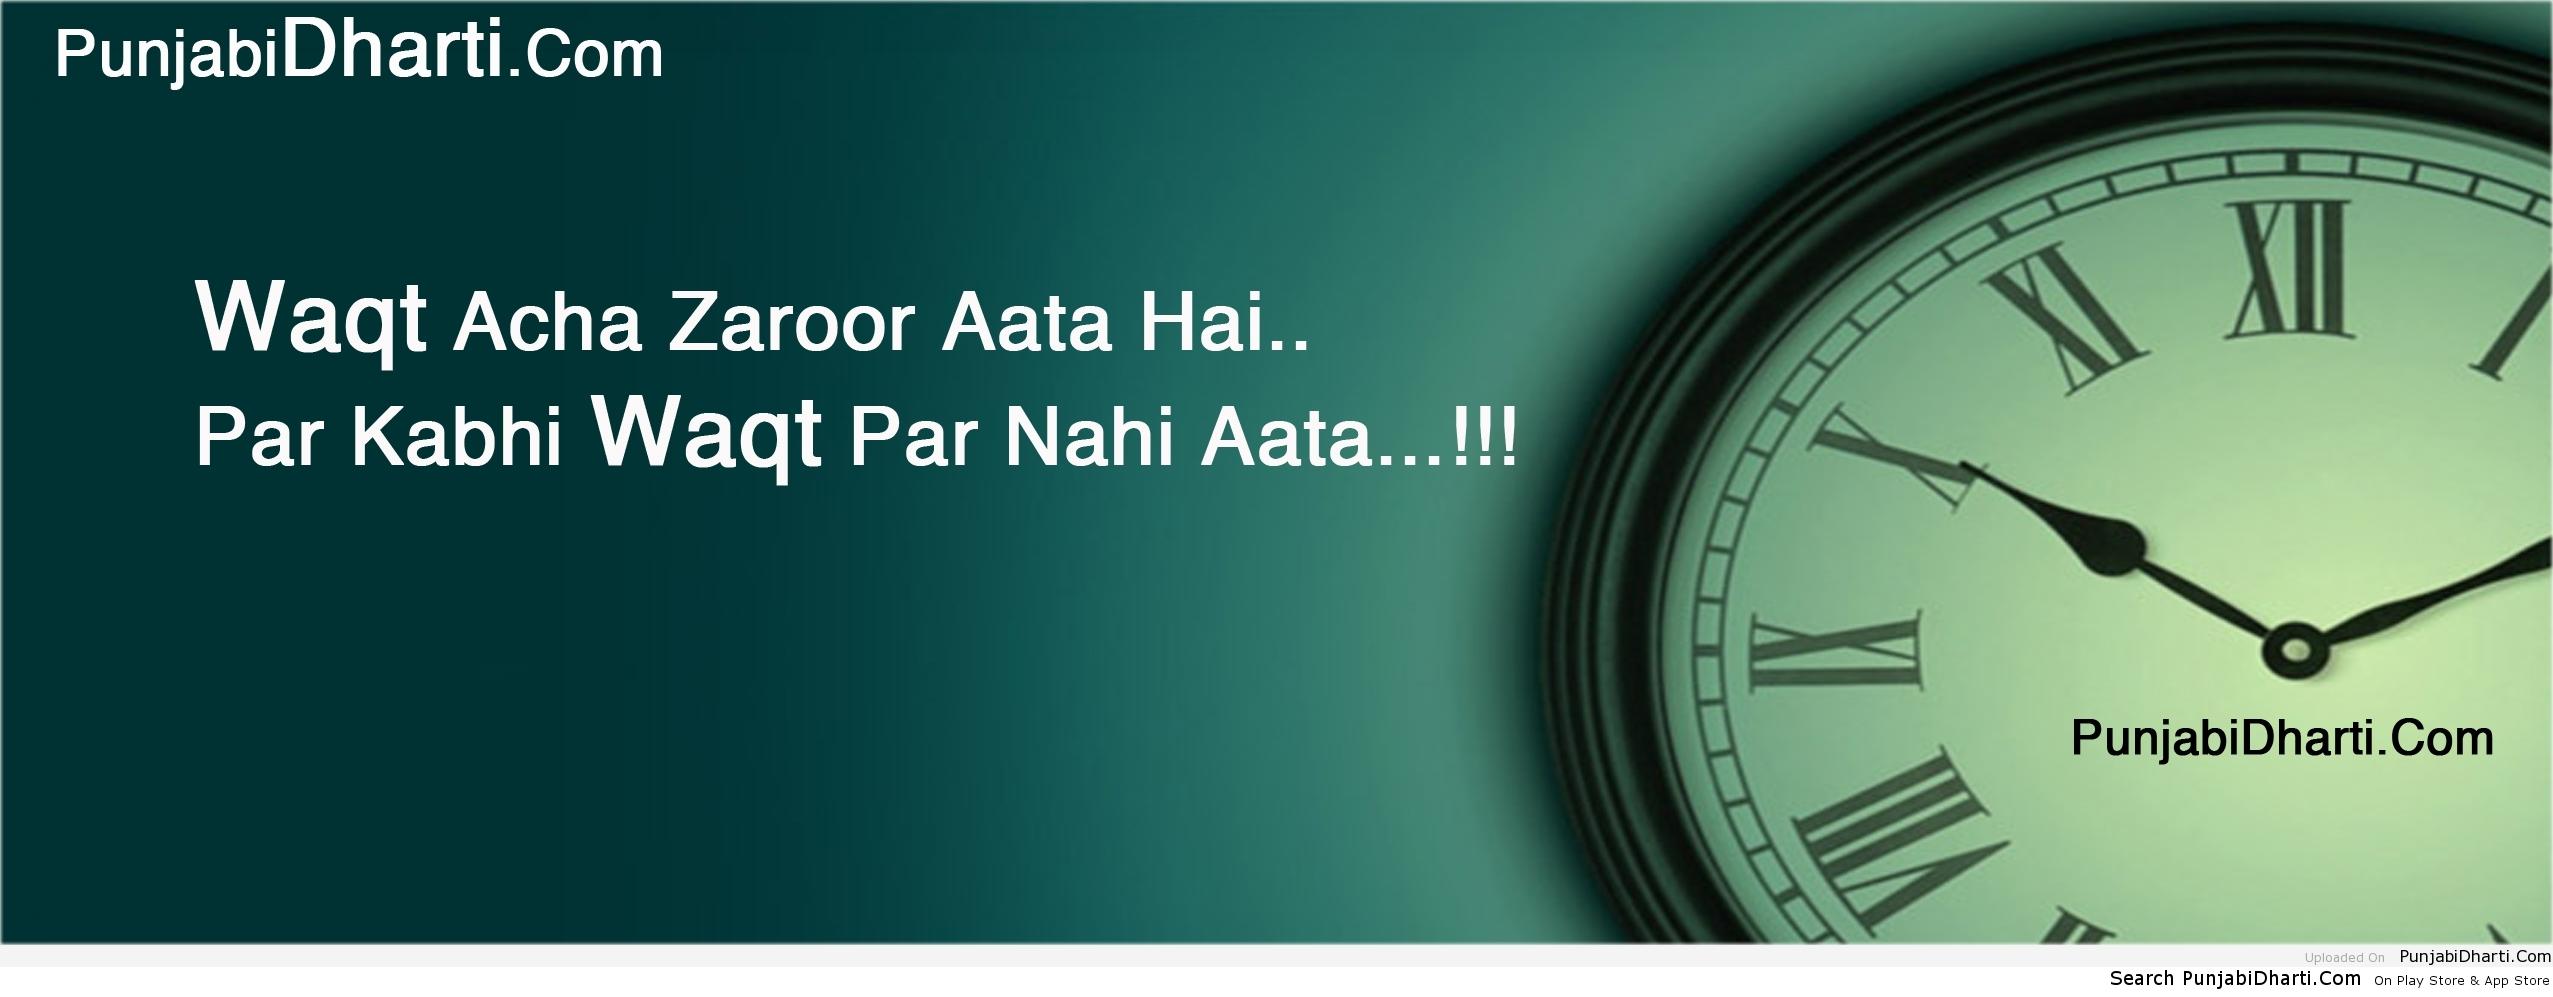 Hd Punjabi Facebook Covers, HD Facebook Covers Photos, HD